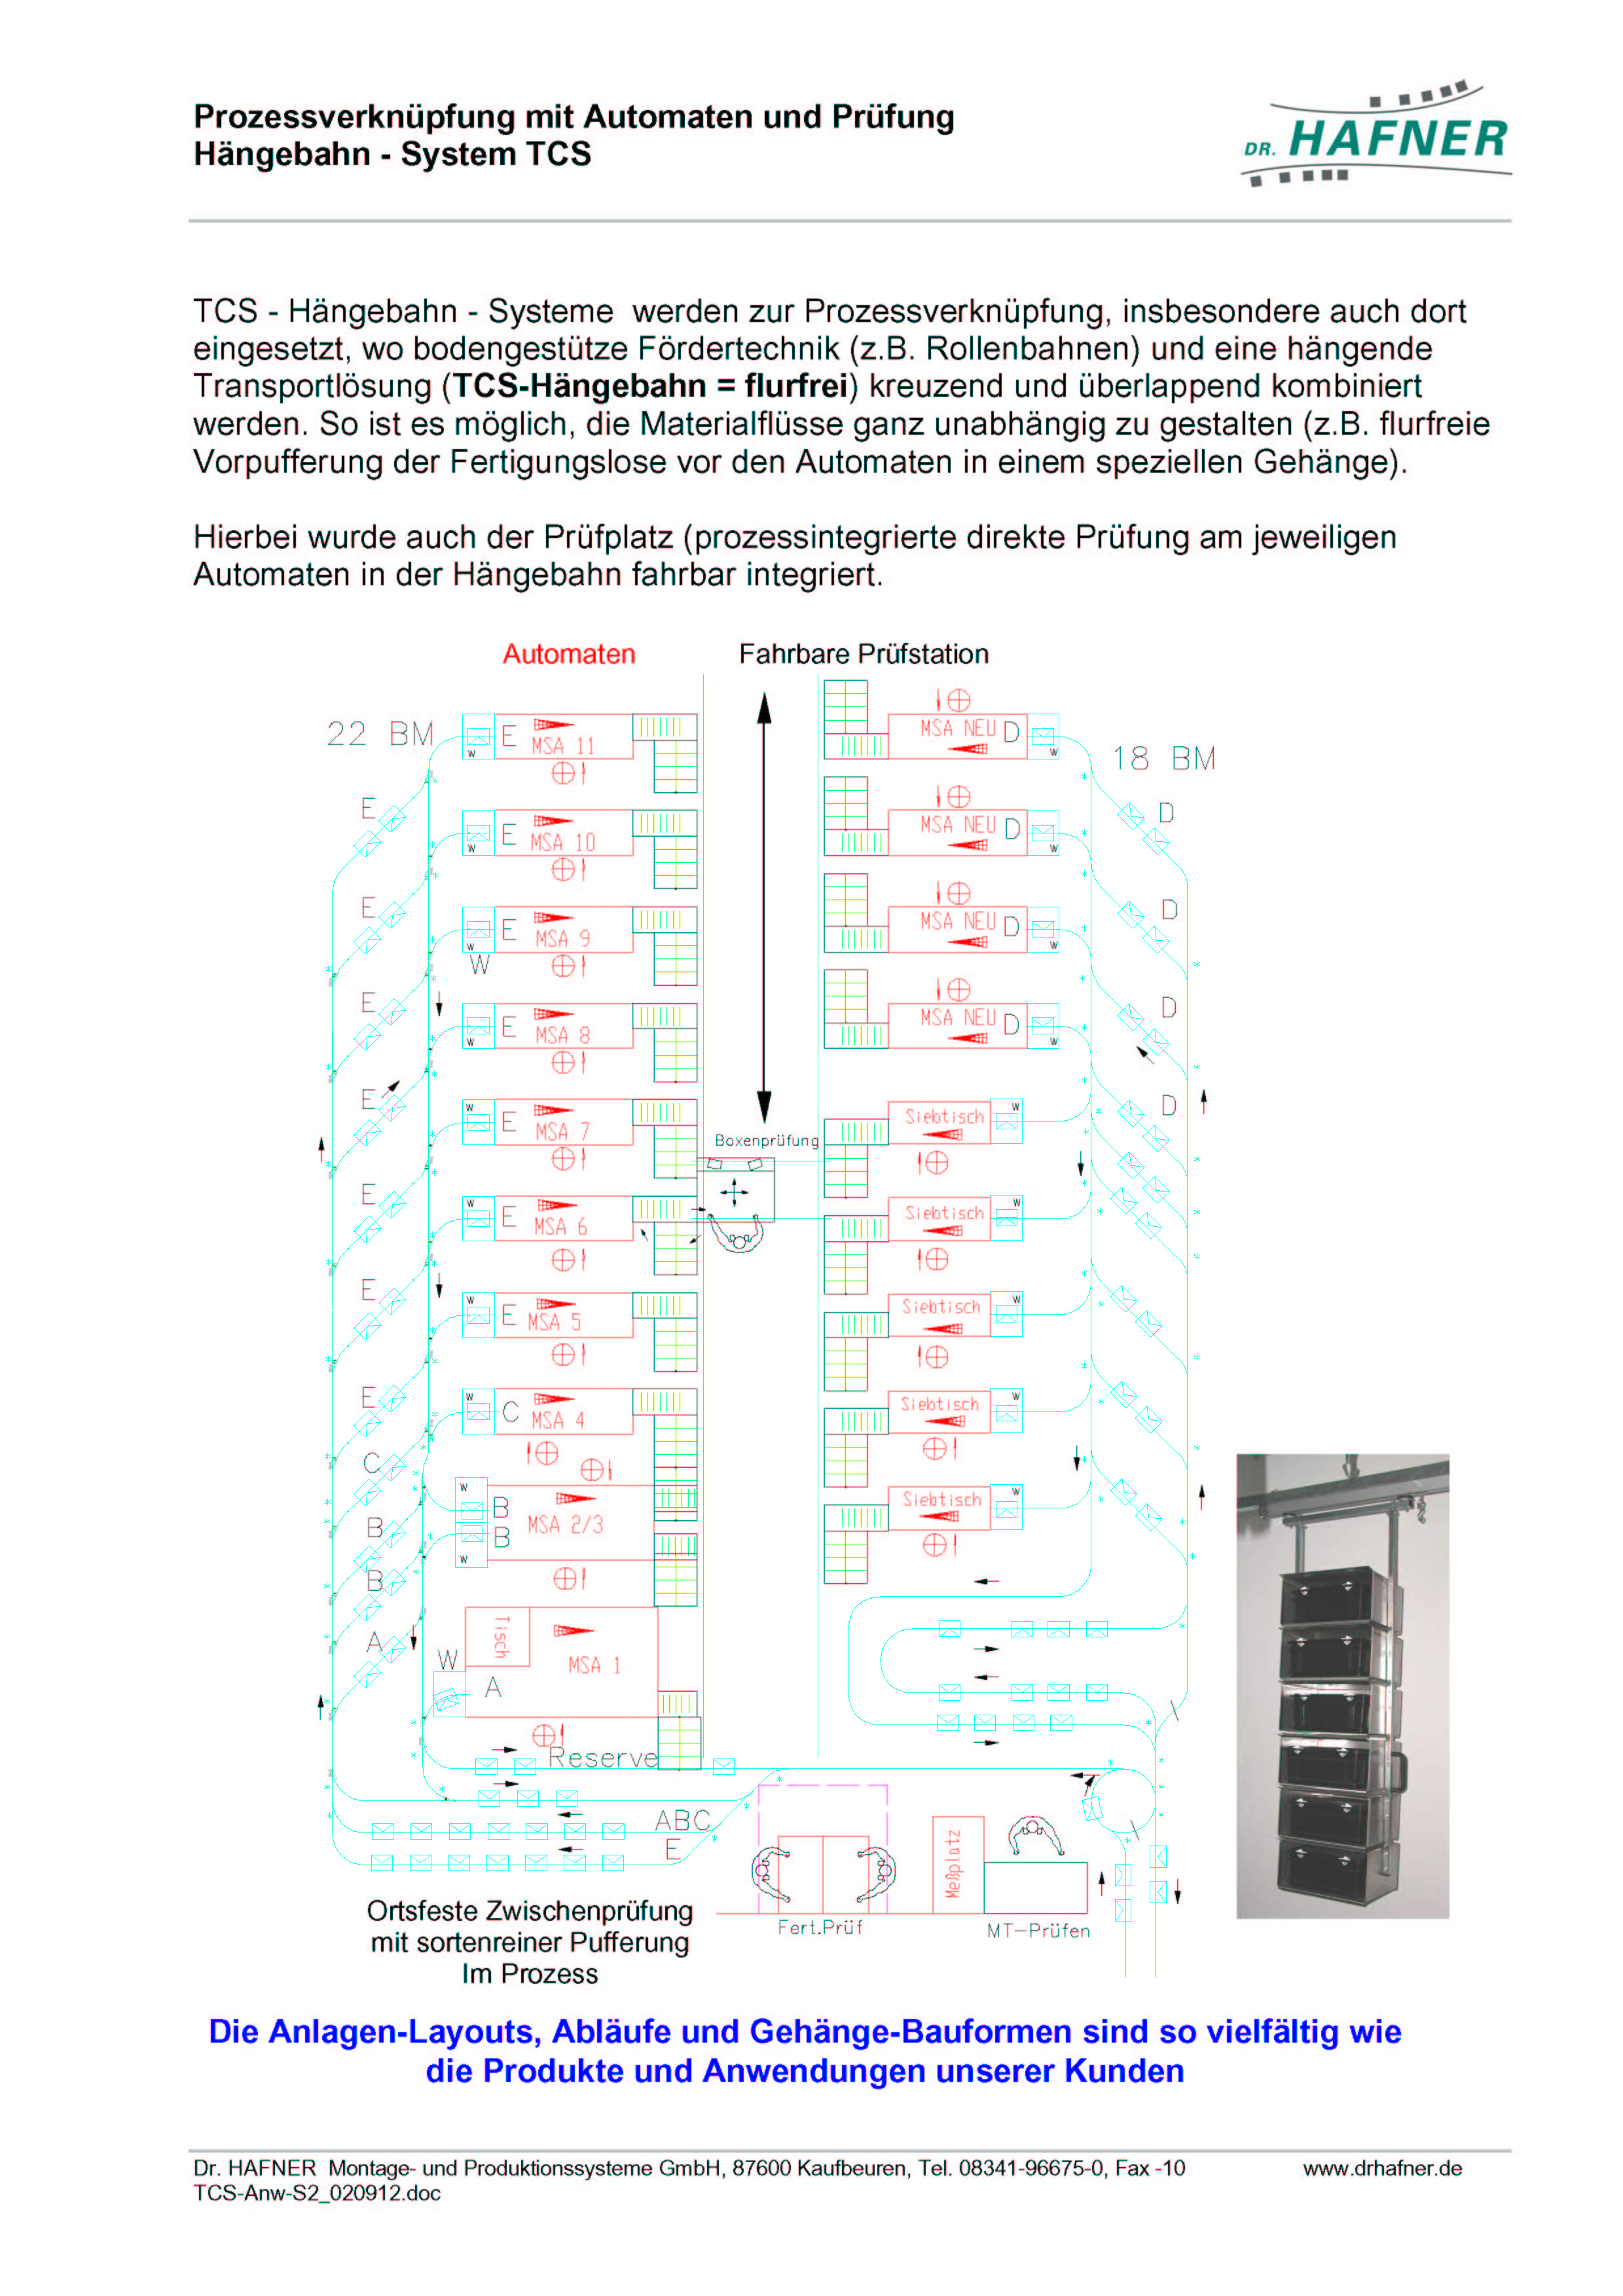 Dr. HAFNER_PKWP_40 Proszessverknüpfung Automaten Prüfung Hängebahn